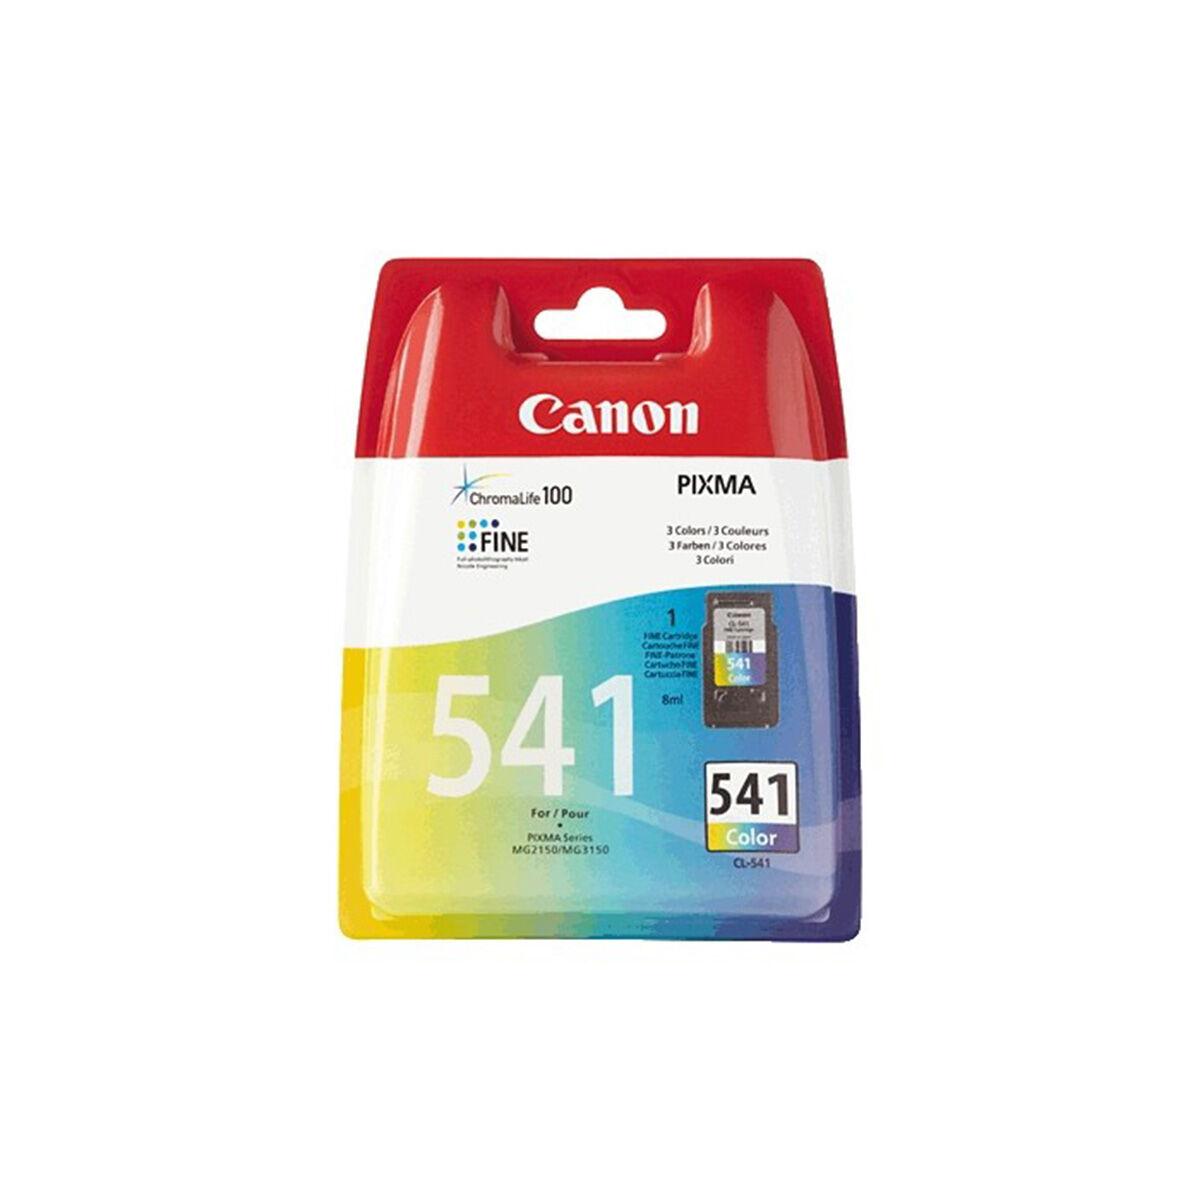 Cartouche Imprimante - Canon - 541 Couleur